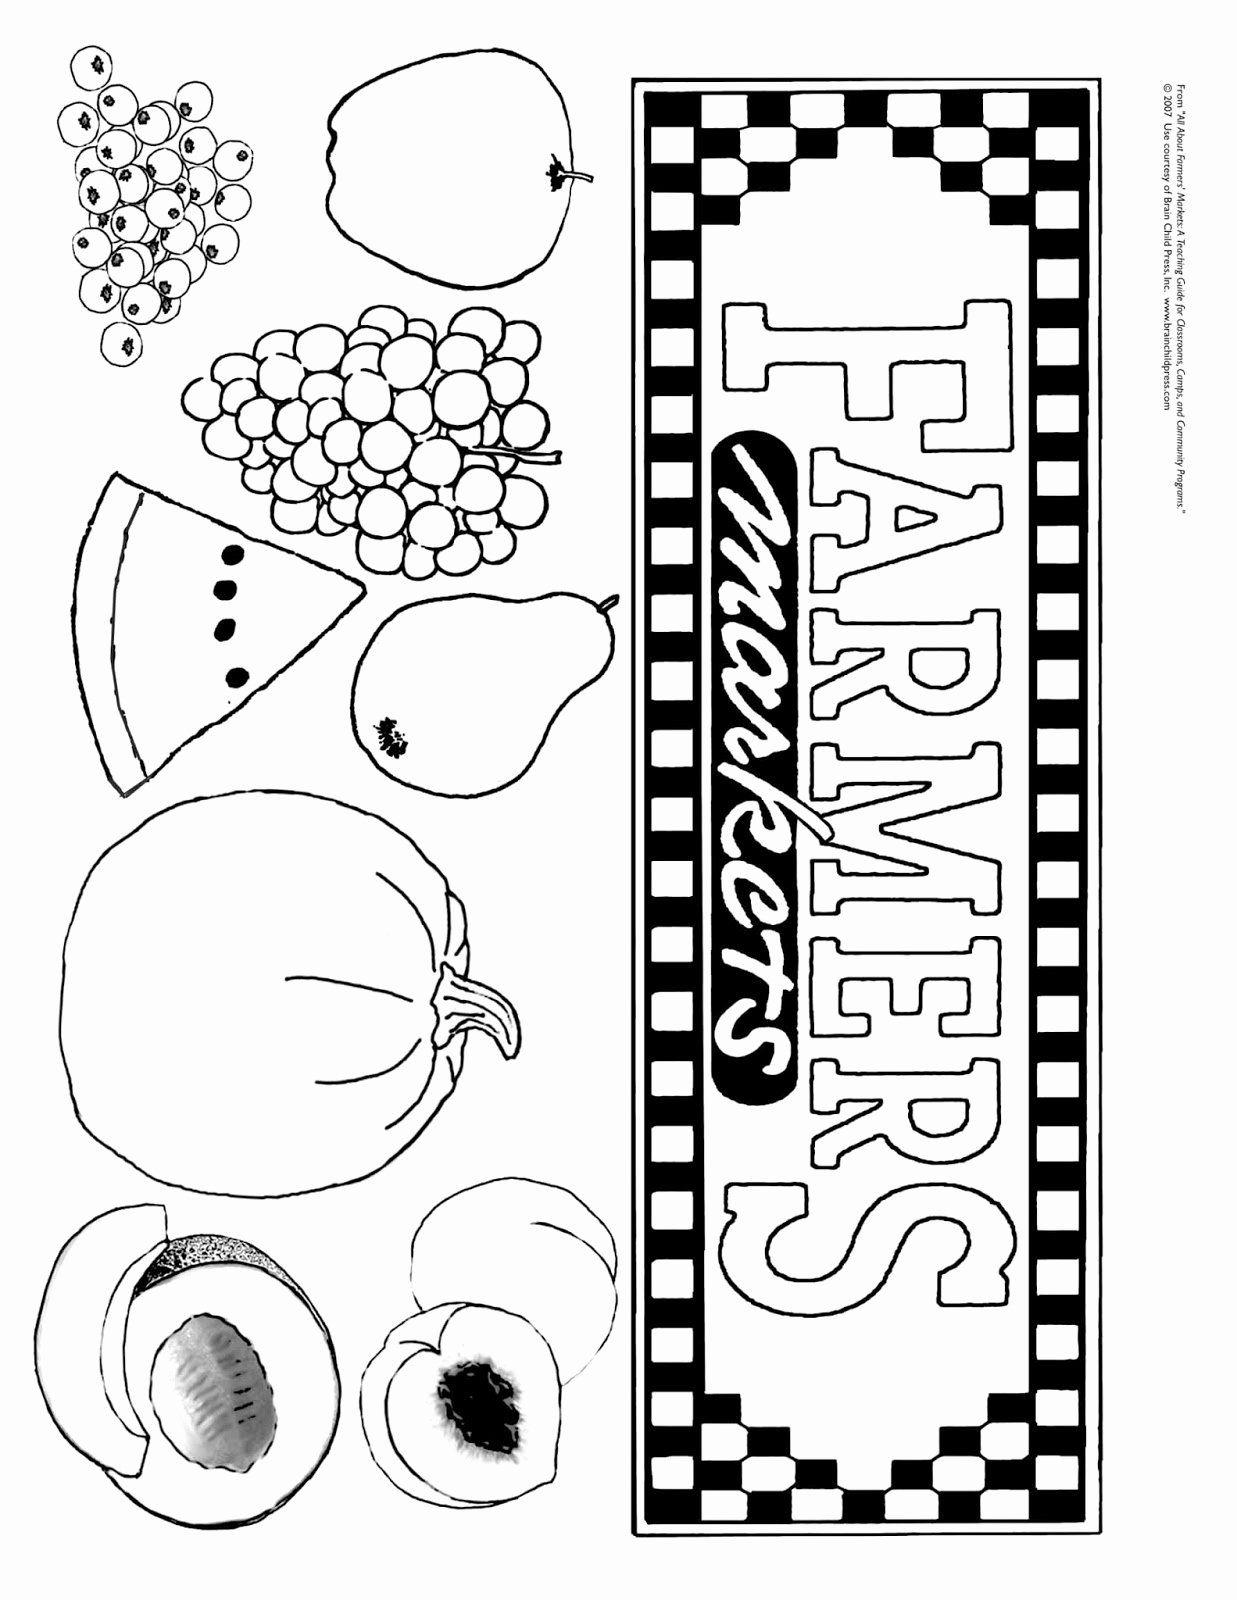 Farm Coloring Pages For Preschoolers Di